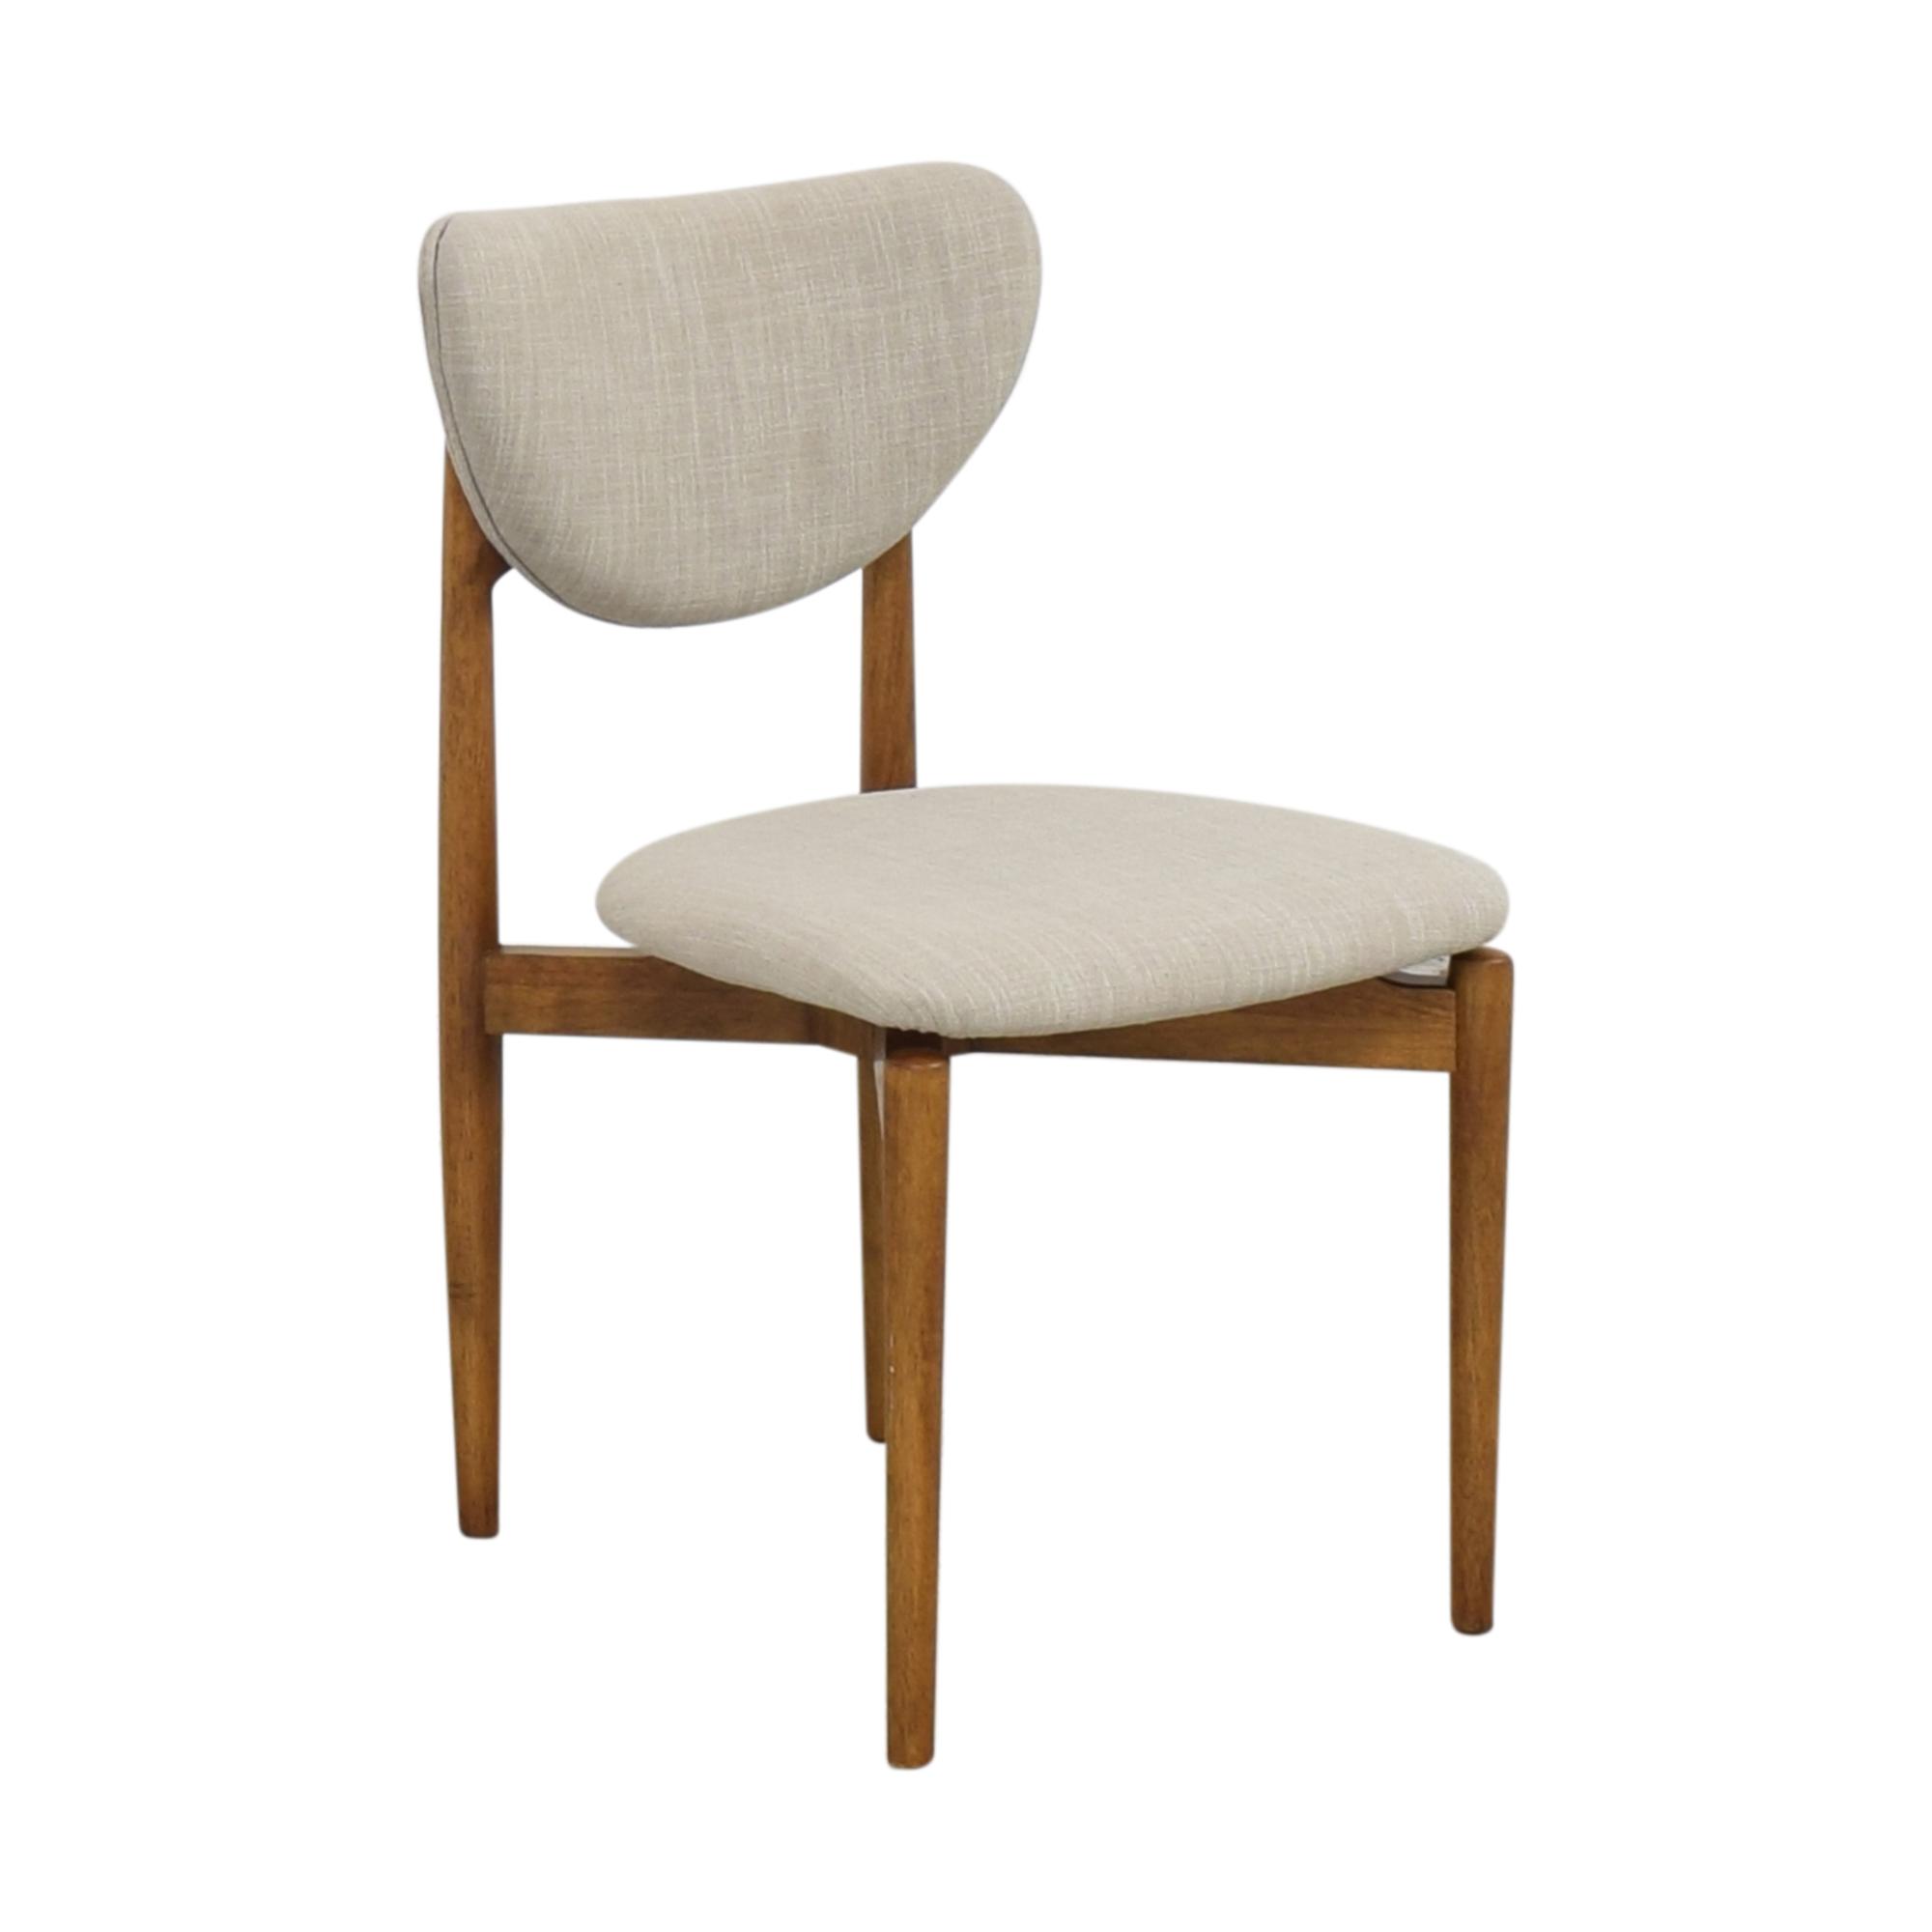 West Elm Dane Side Chair / Chairs